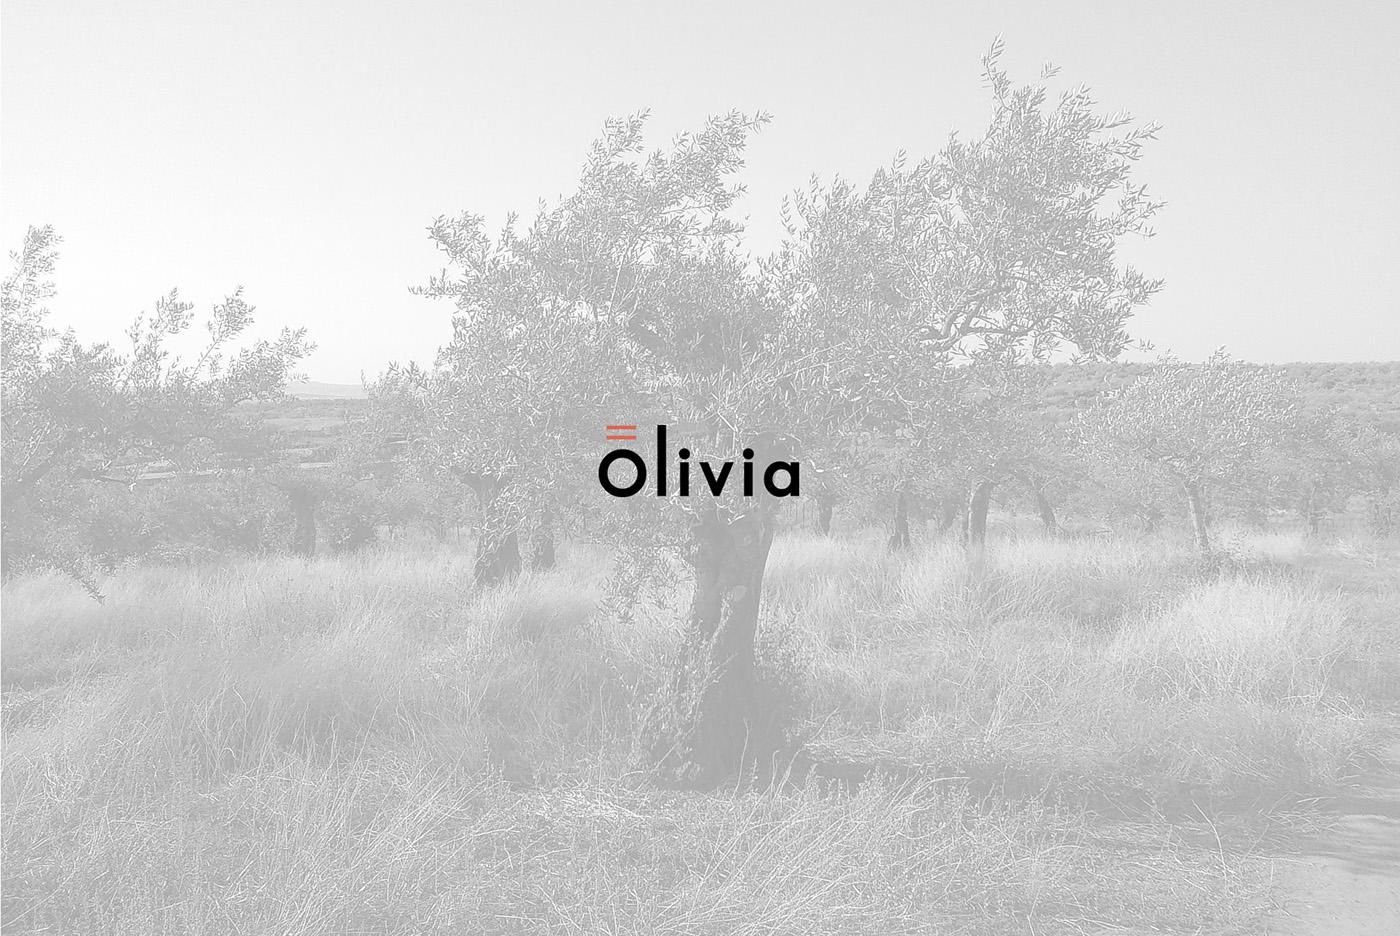 Olivia Olive Products On Behance